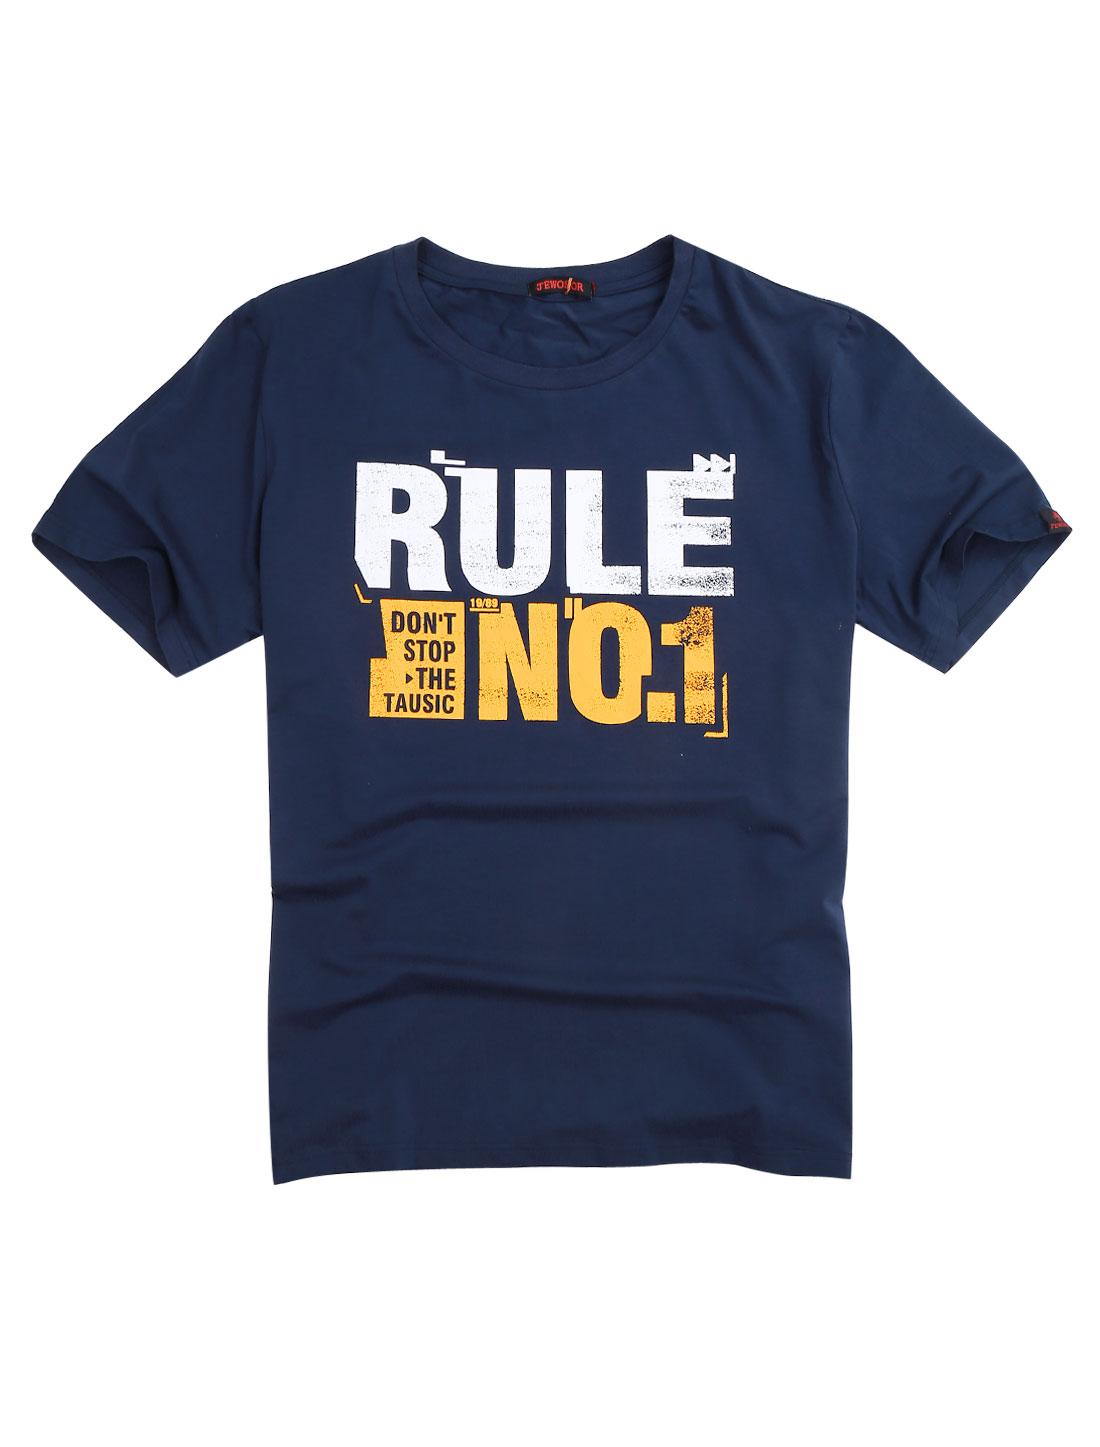 Men Round Neck Letters Prints Fashion Casual T-shirt Navy Blue XL